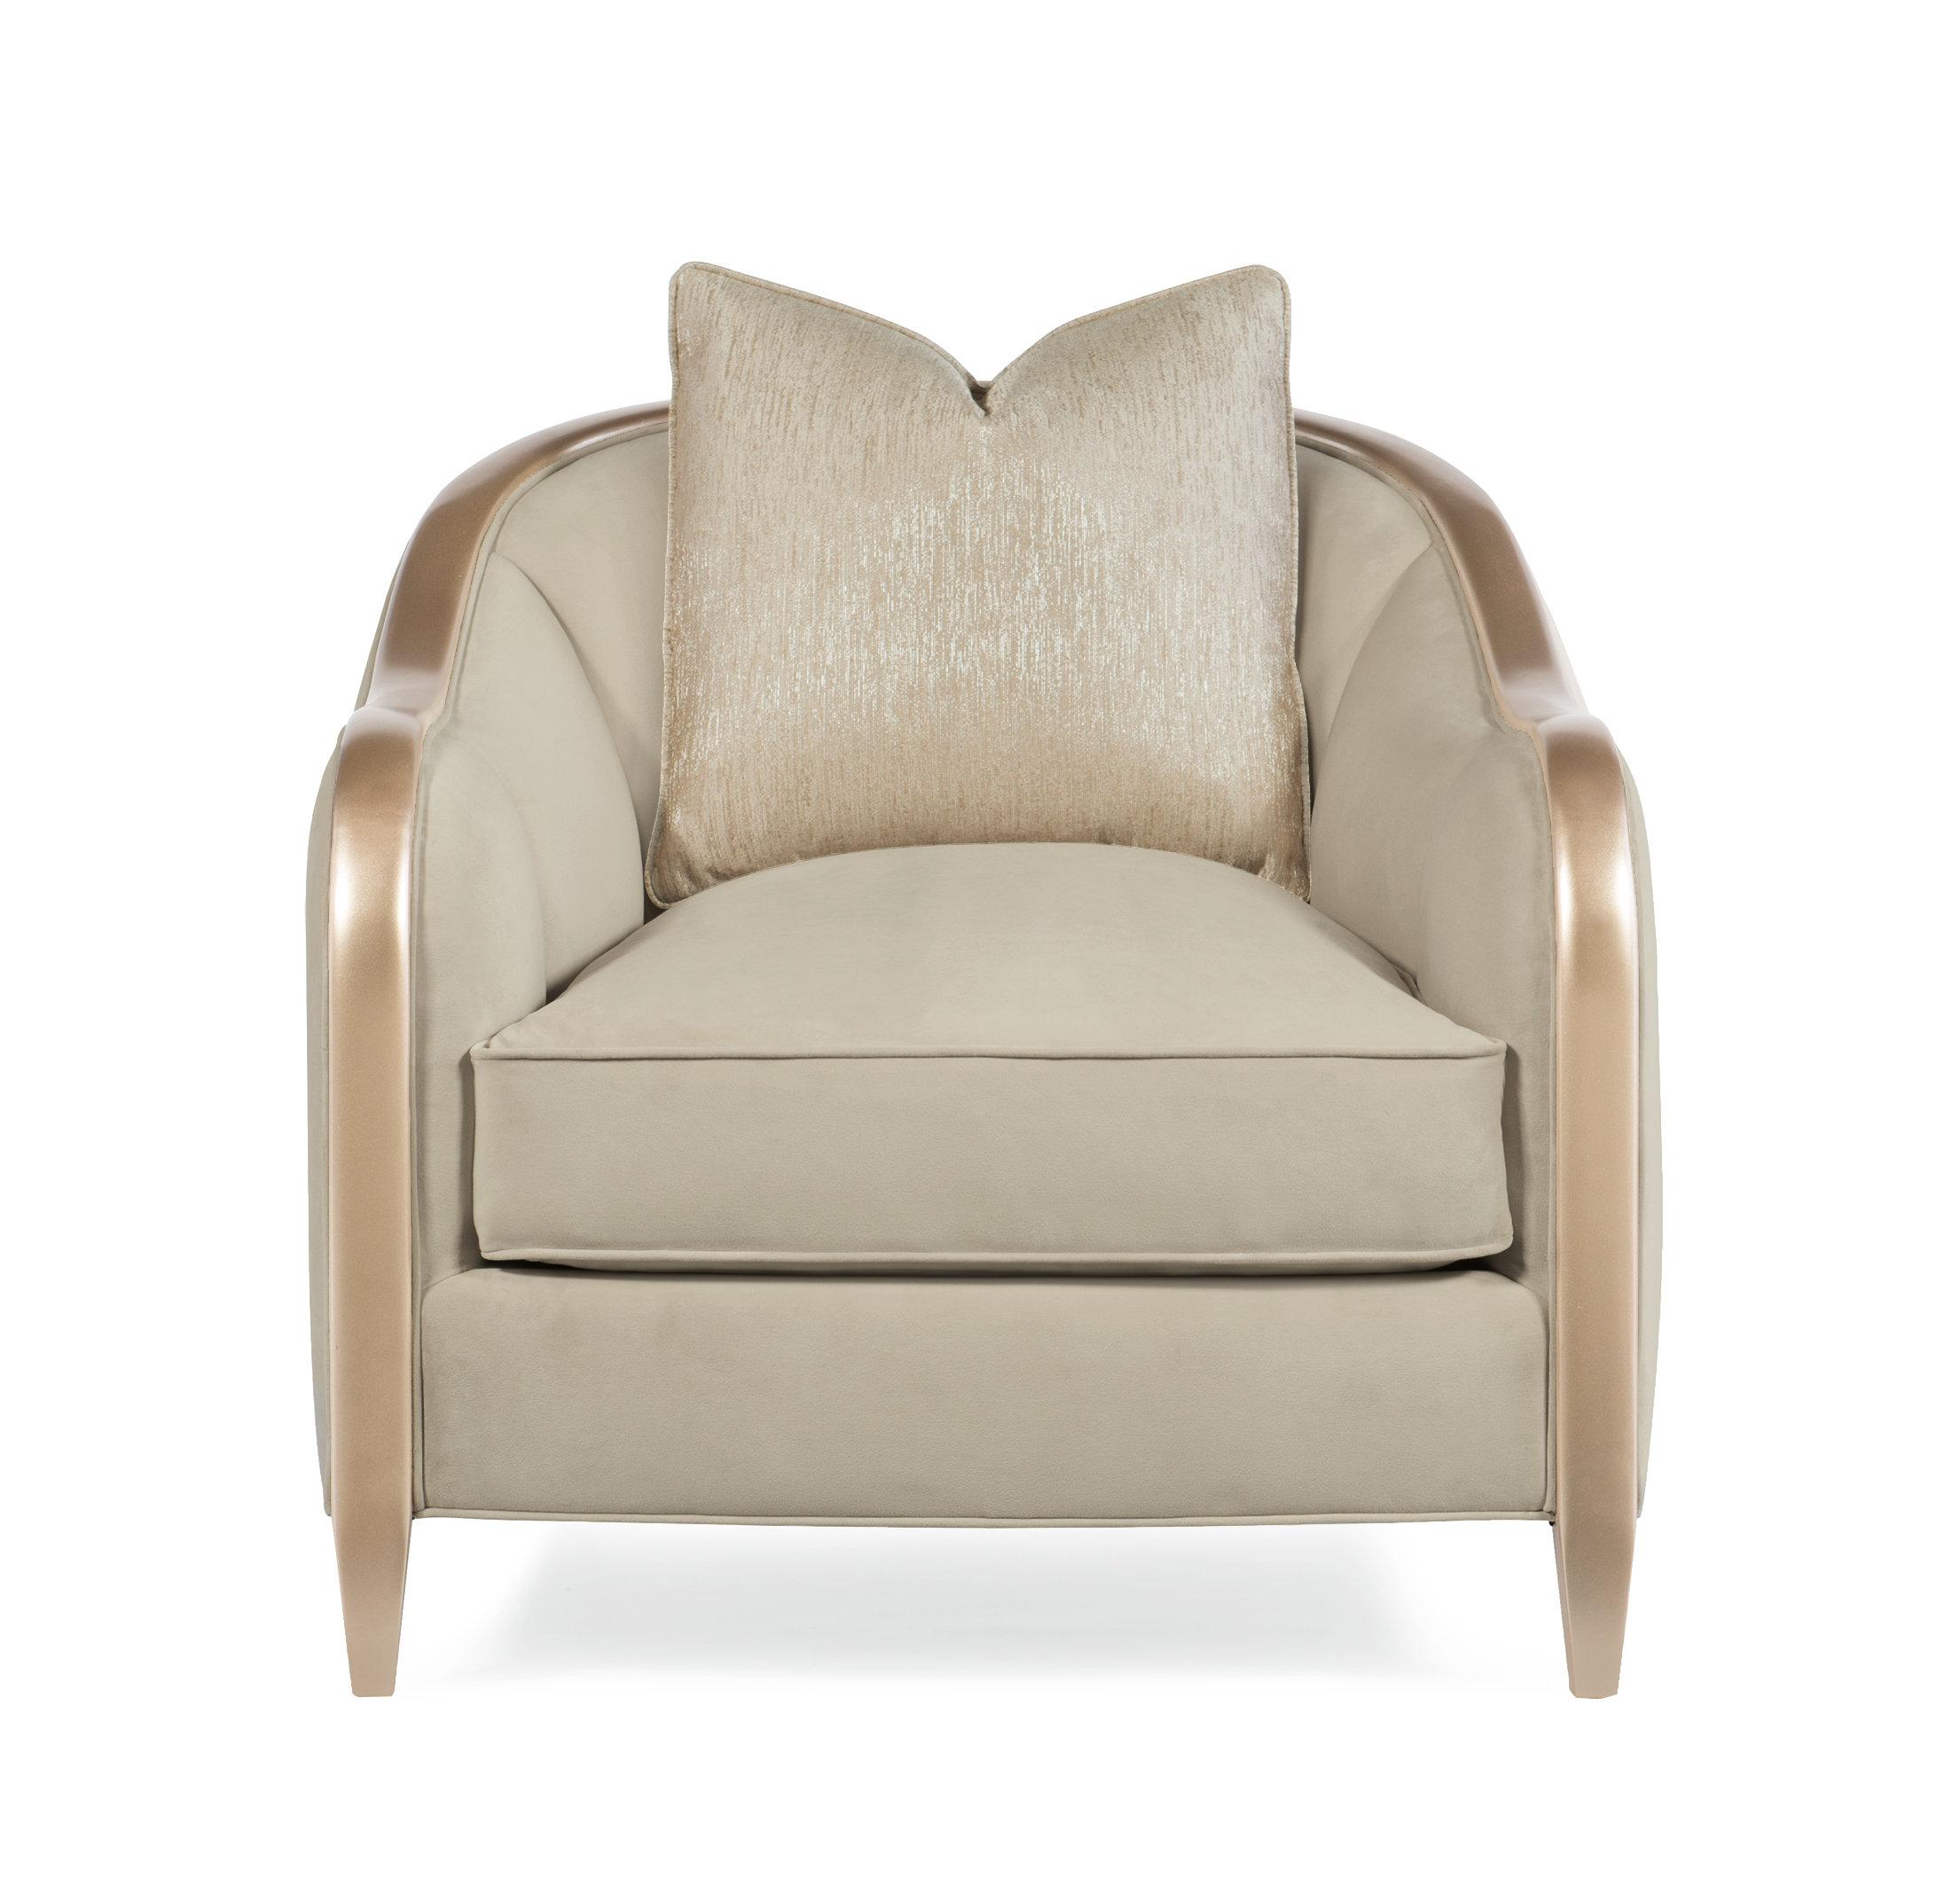 Caracole Compositions Adela 34 W Tufted Cotton Blend Down Cushion Armchair Wayfair